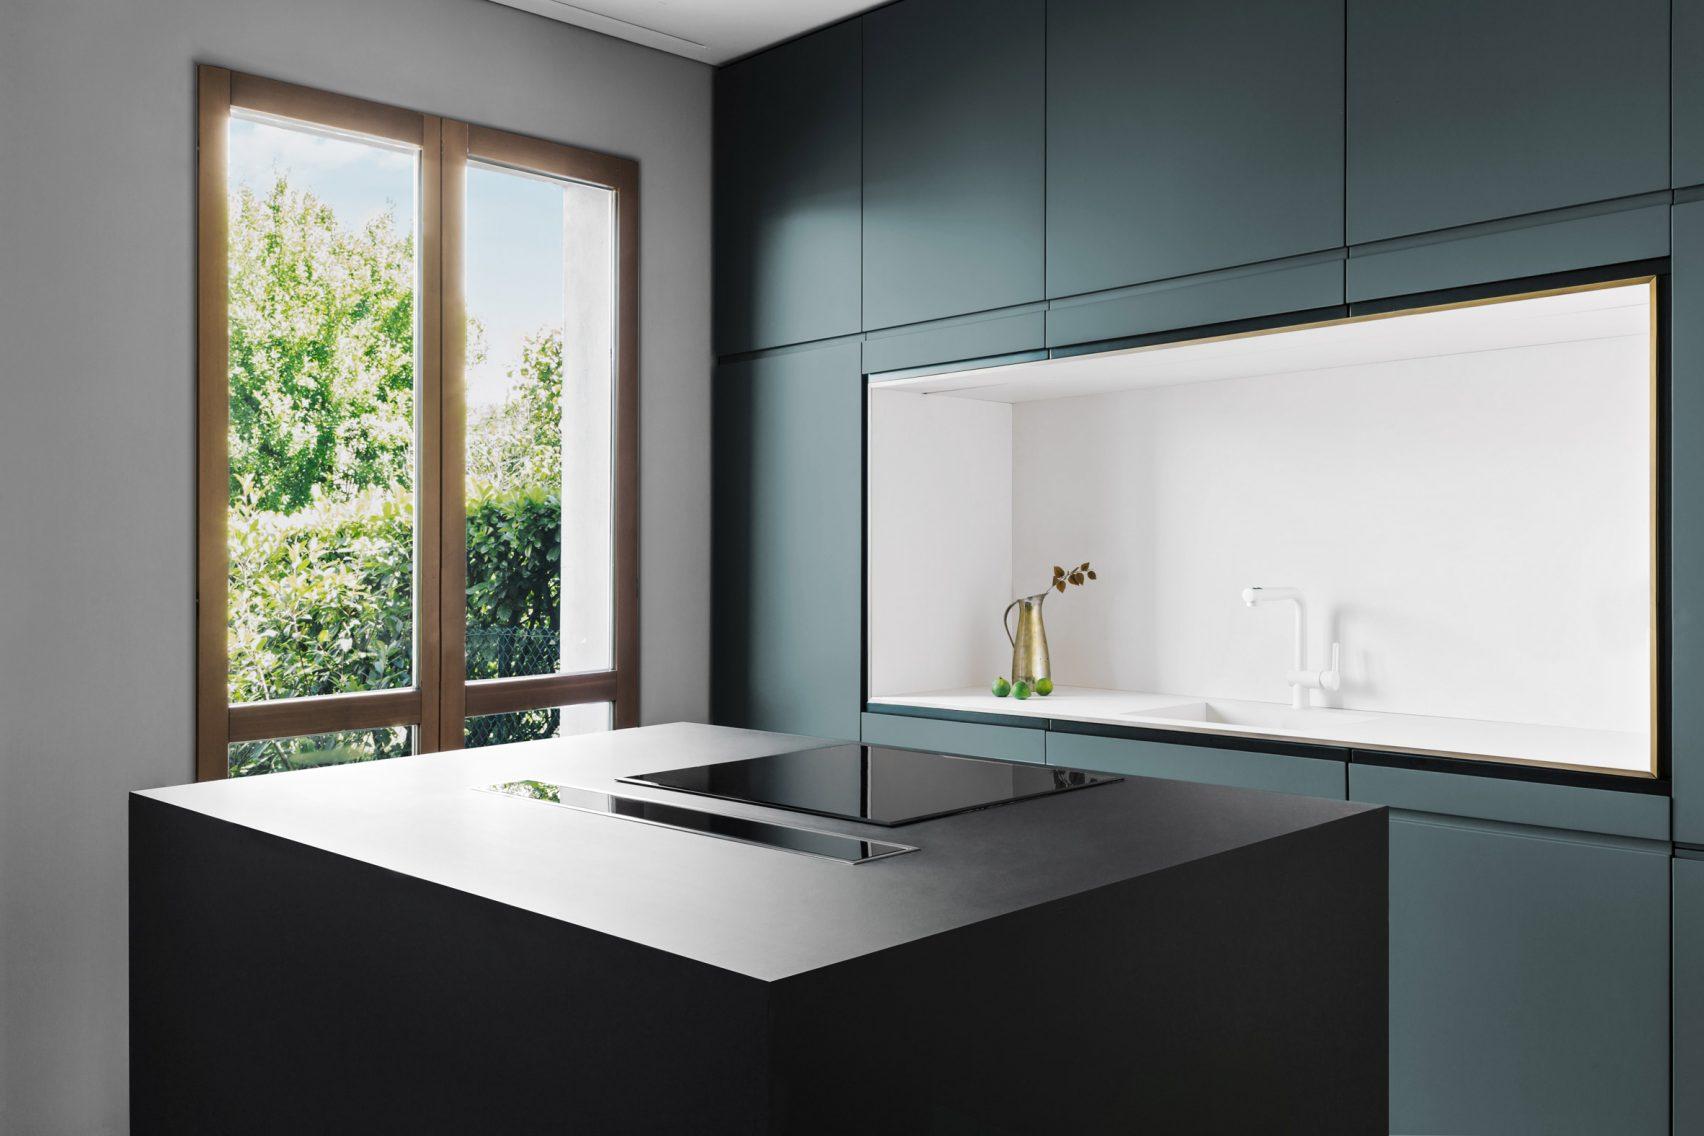 Strakke moderne keuken met blauwe wandkast en zwart kookeiland